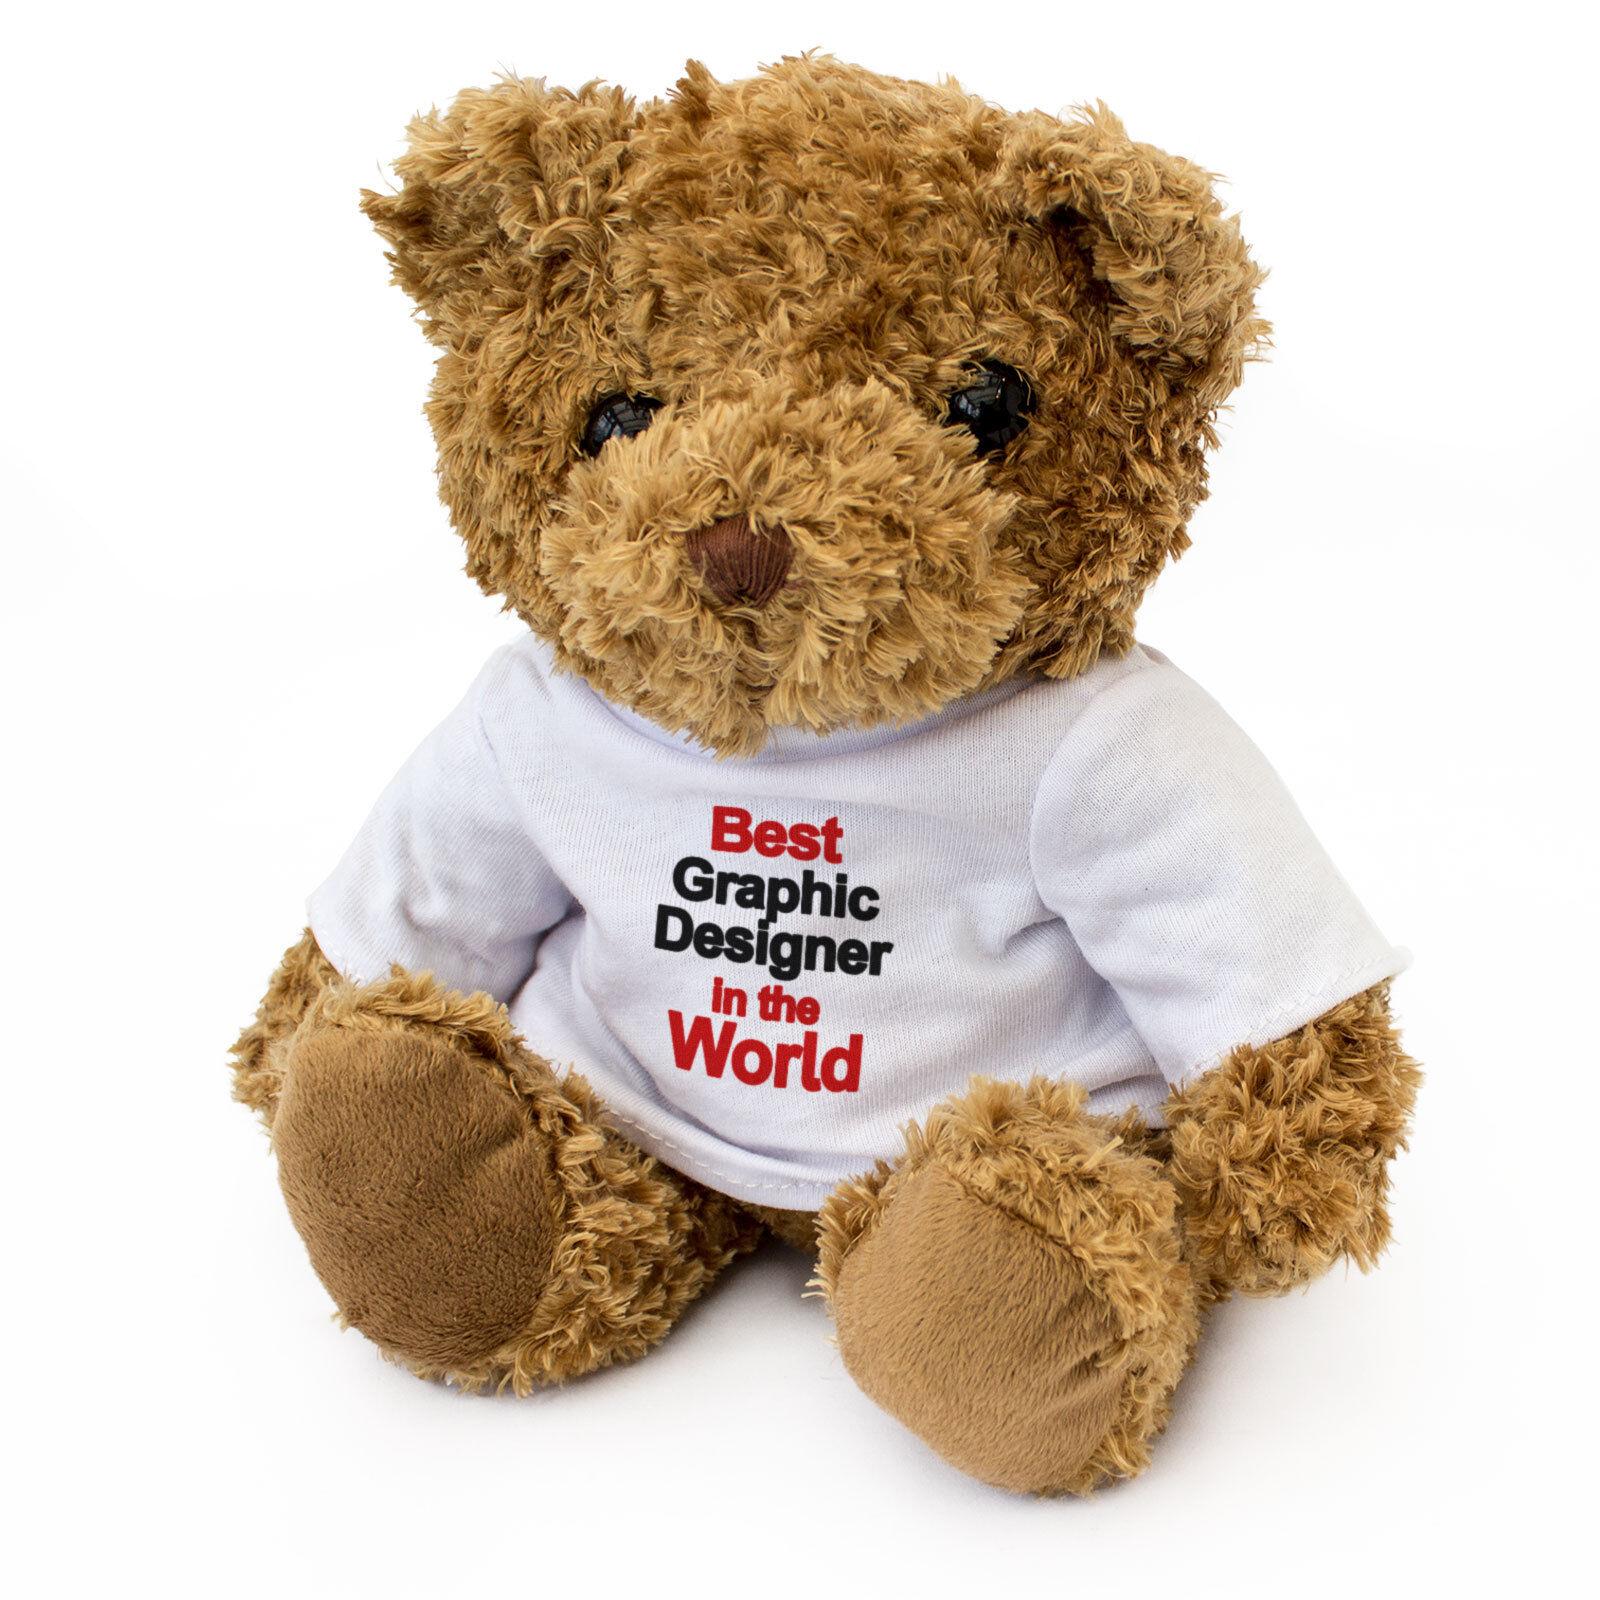 Neu Neu Neu - Beste Grafik Designer in the World - Teddybär süß - Geschenk Auszeichnung 33406a